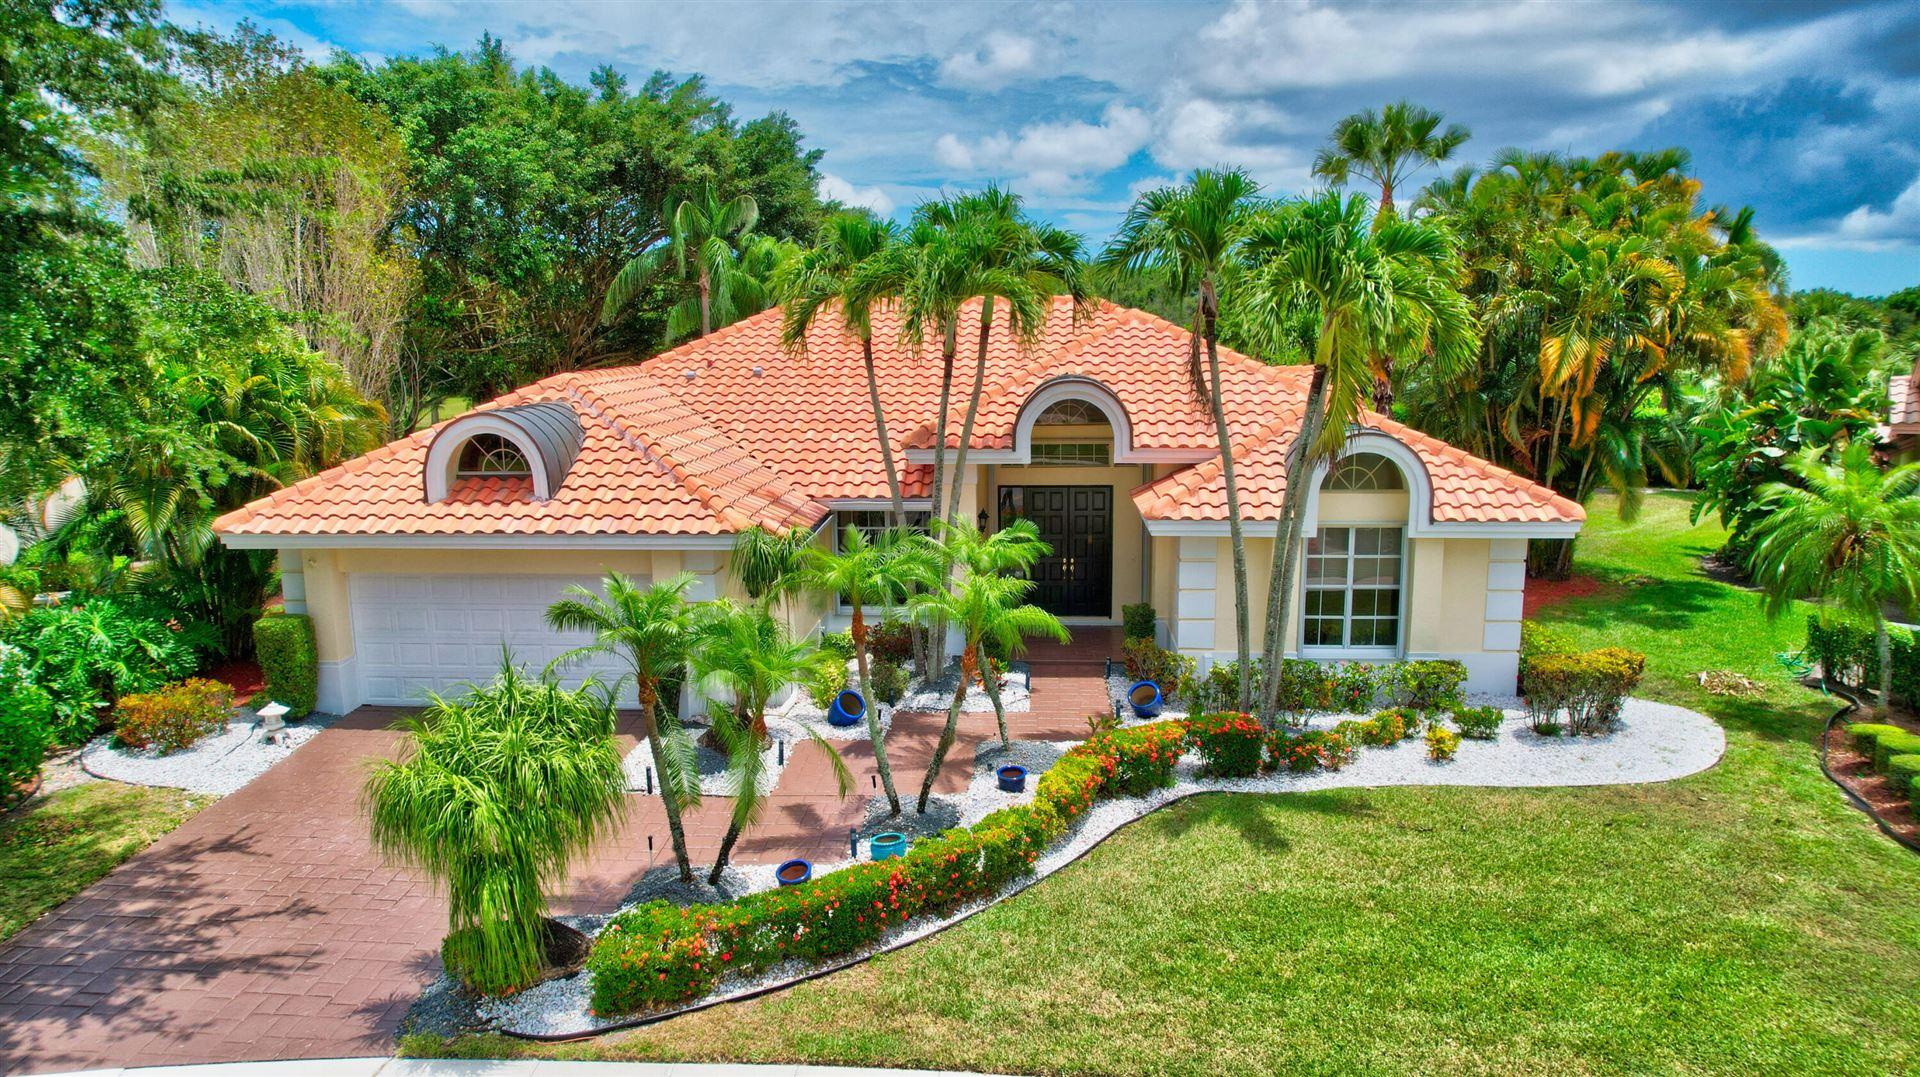 7644 Dorchester Road, Boynton Beach, FL 33472 - MLS#: RX-10714093